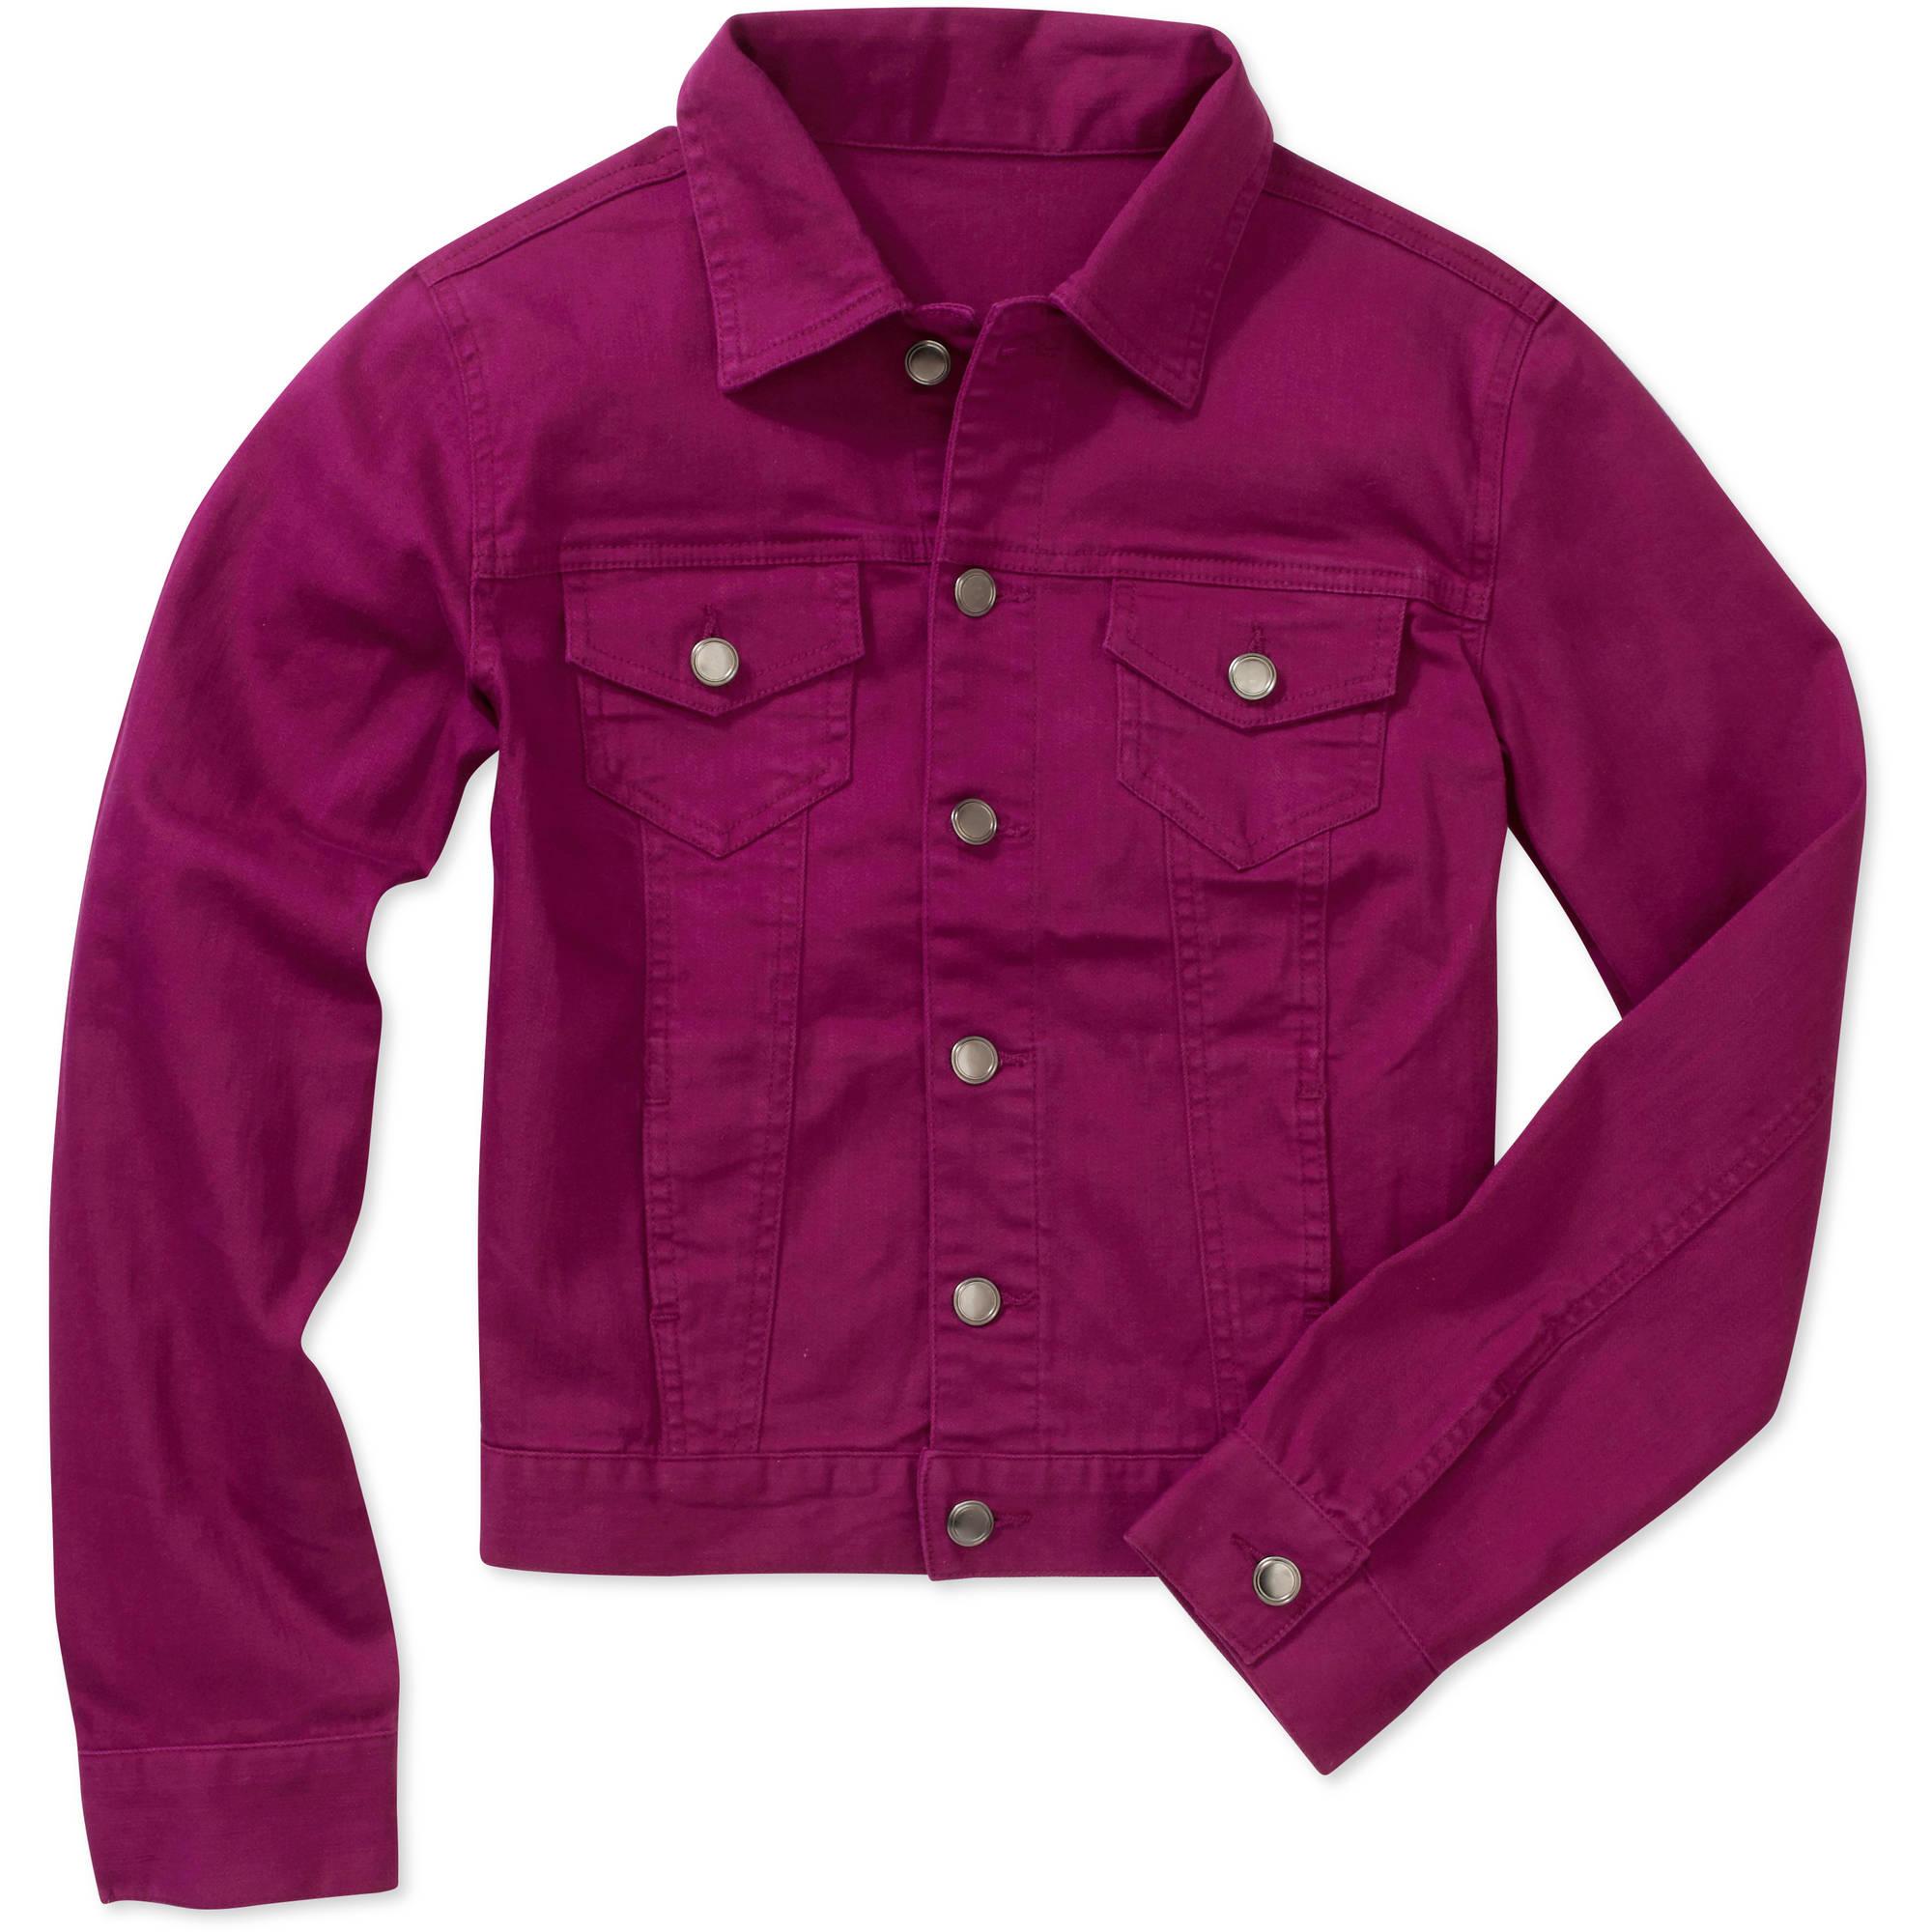 b04da440b53 Walmart Faded Glory Denim Shirt - Cotswold Hire